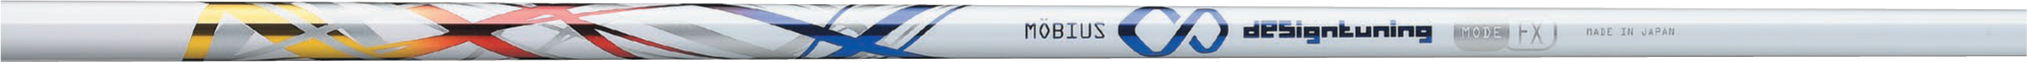 MöBIUS Designtuning FX (フェアウェイ用/1フレックス仕様)